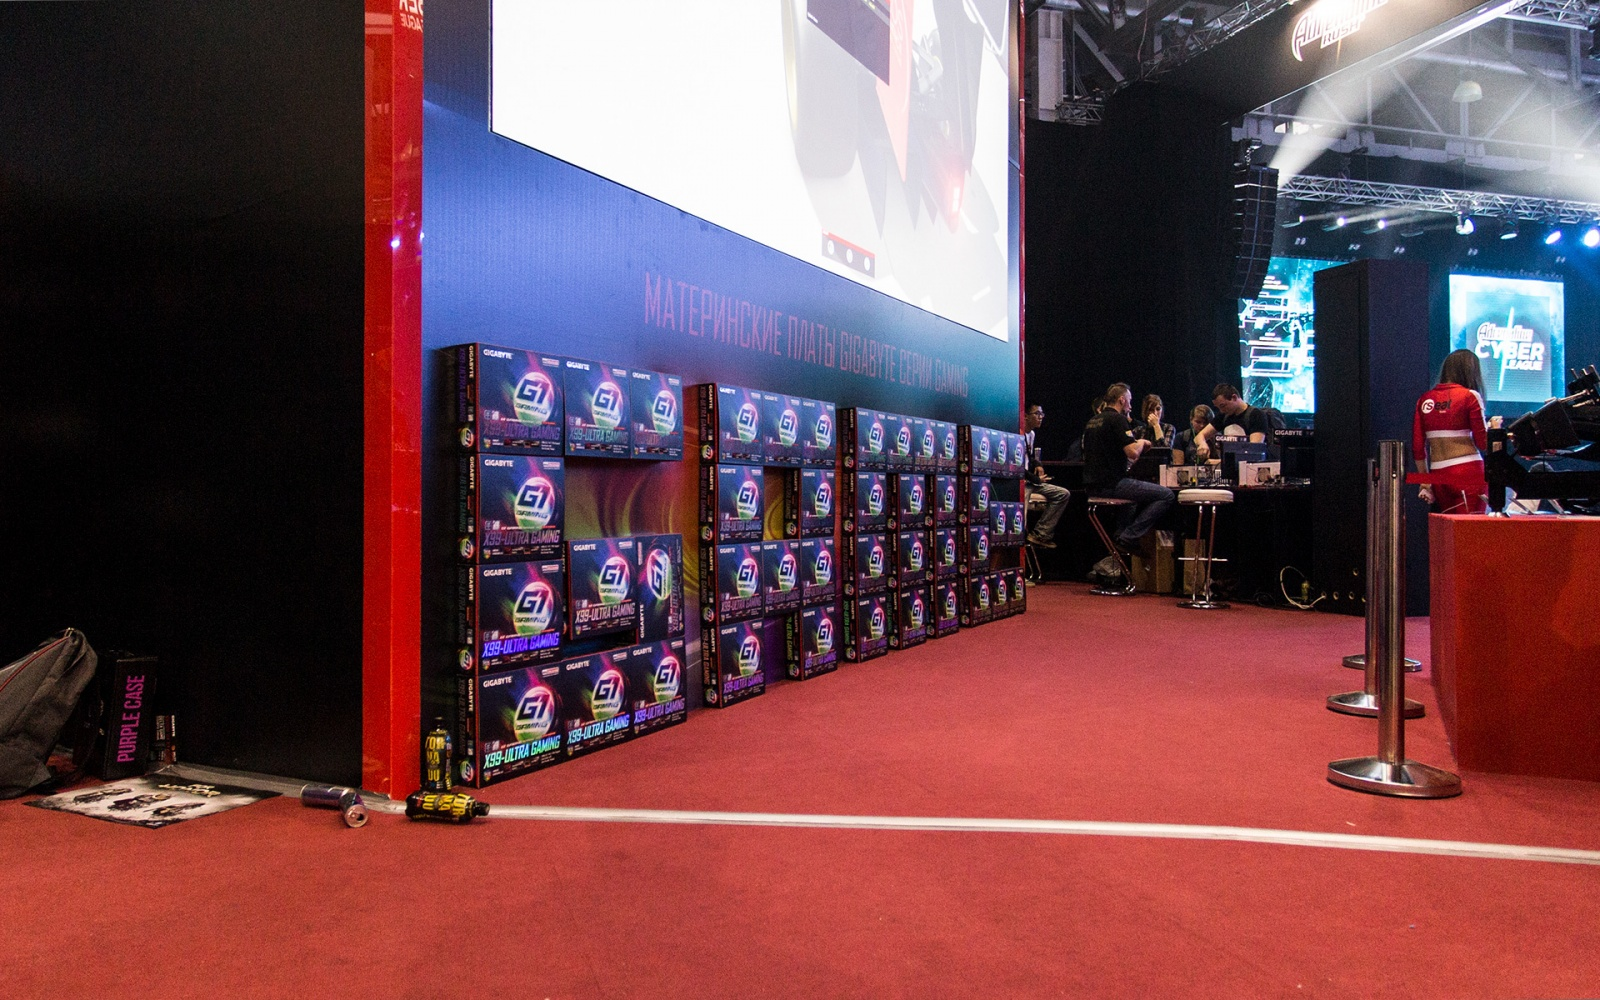 Intel значит побеждать: захват игромира прошёл успешно - 8